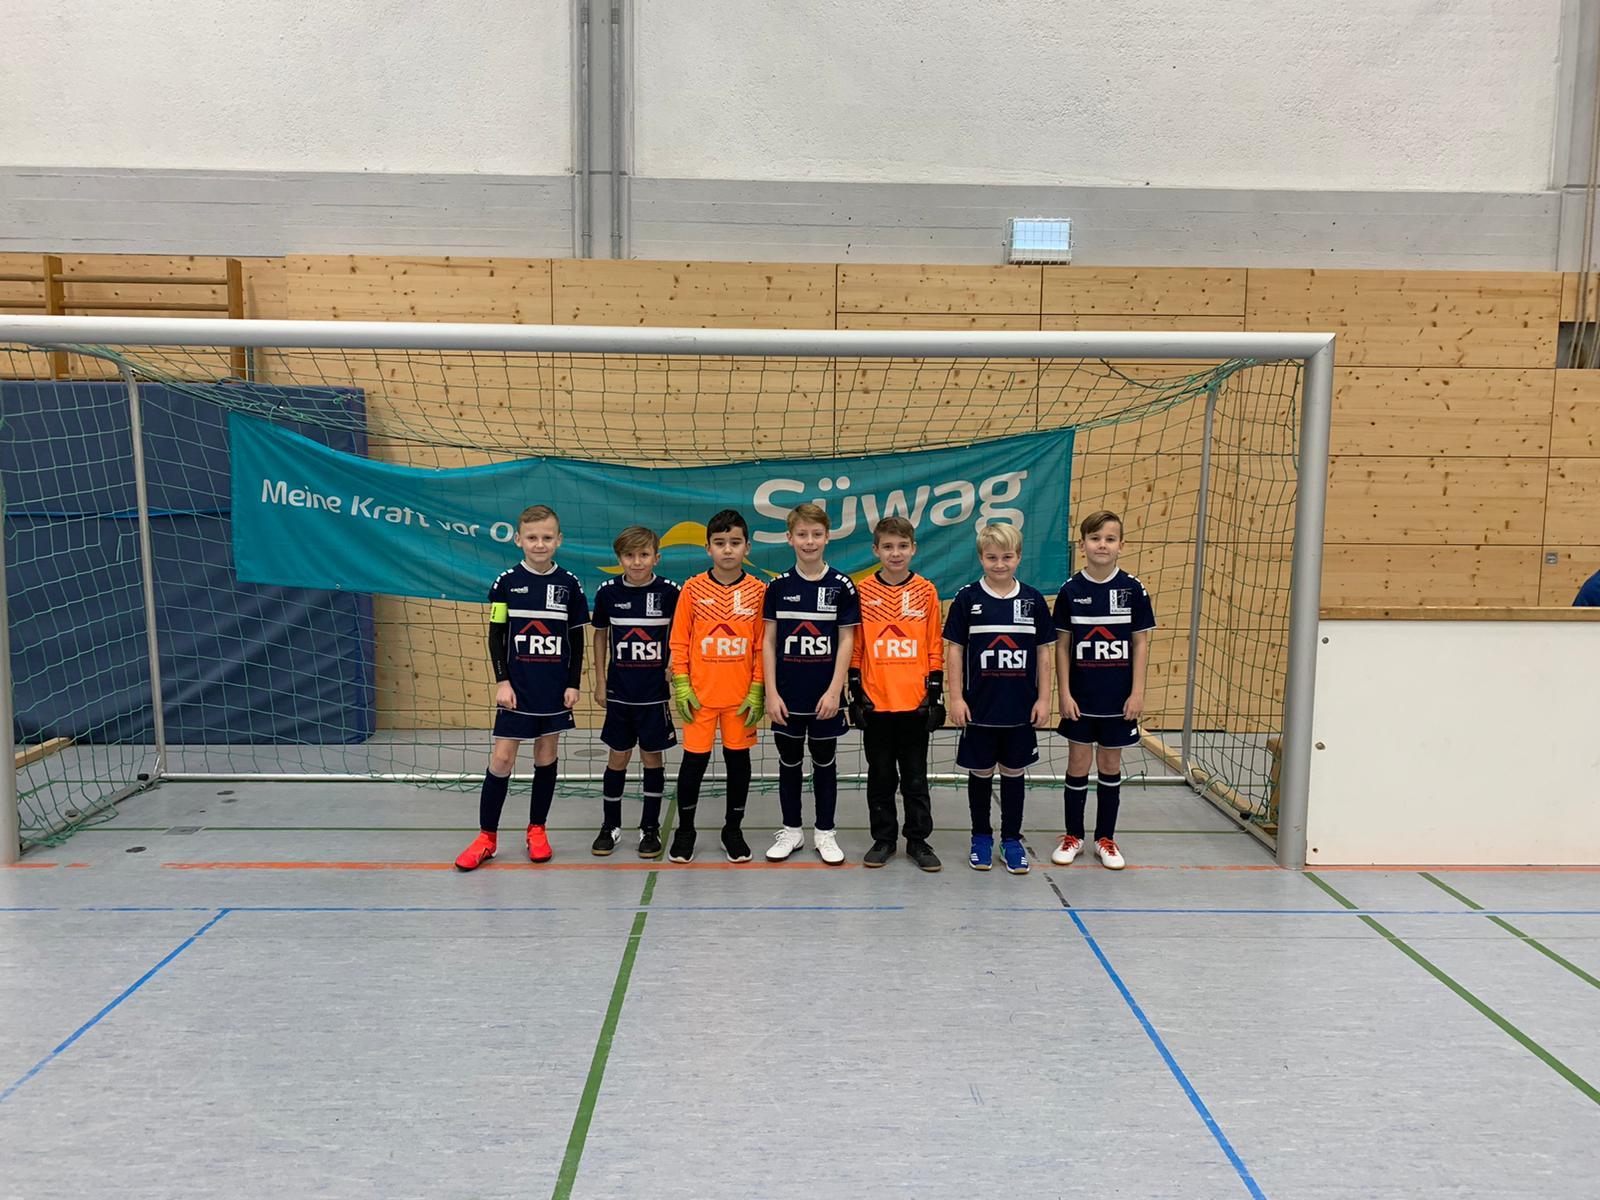 E-Junioren U10 - SSV Kaldauen - Süwag Hallencup 2020